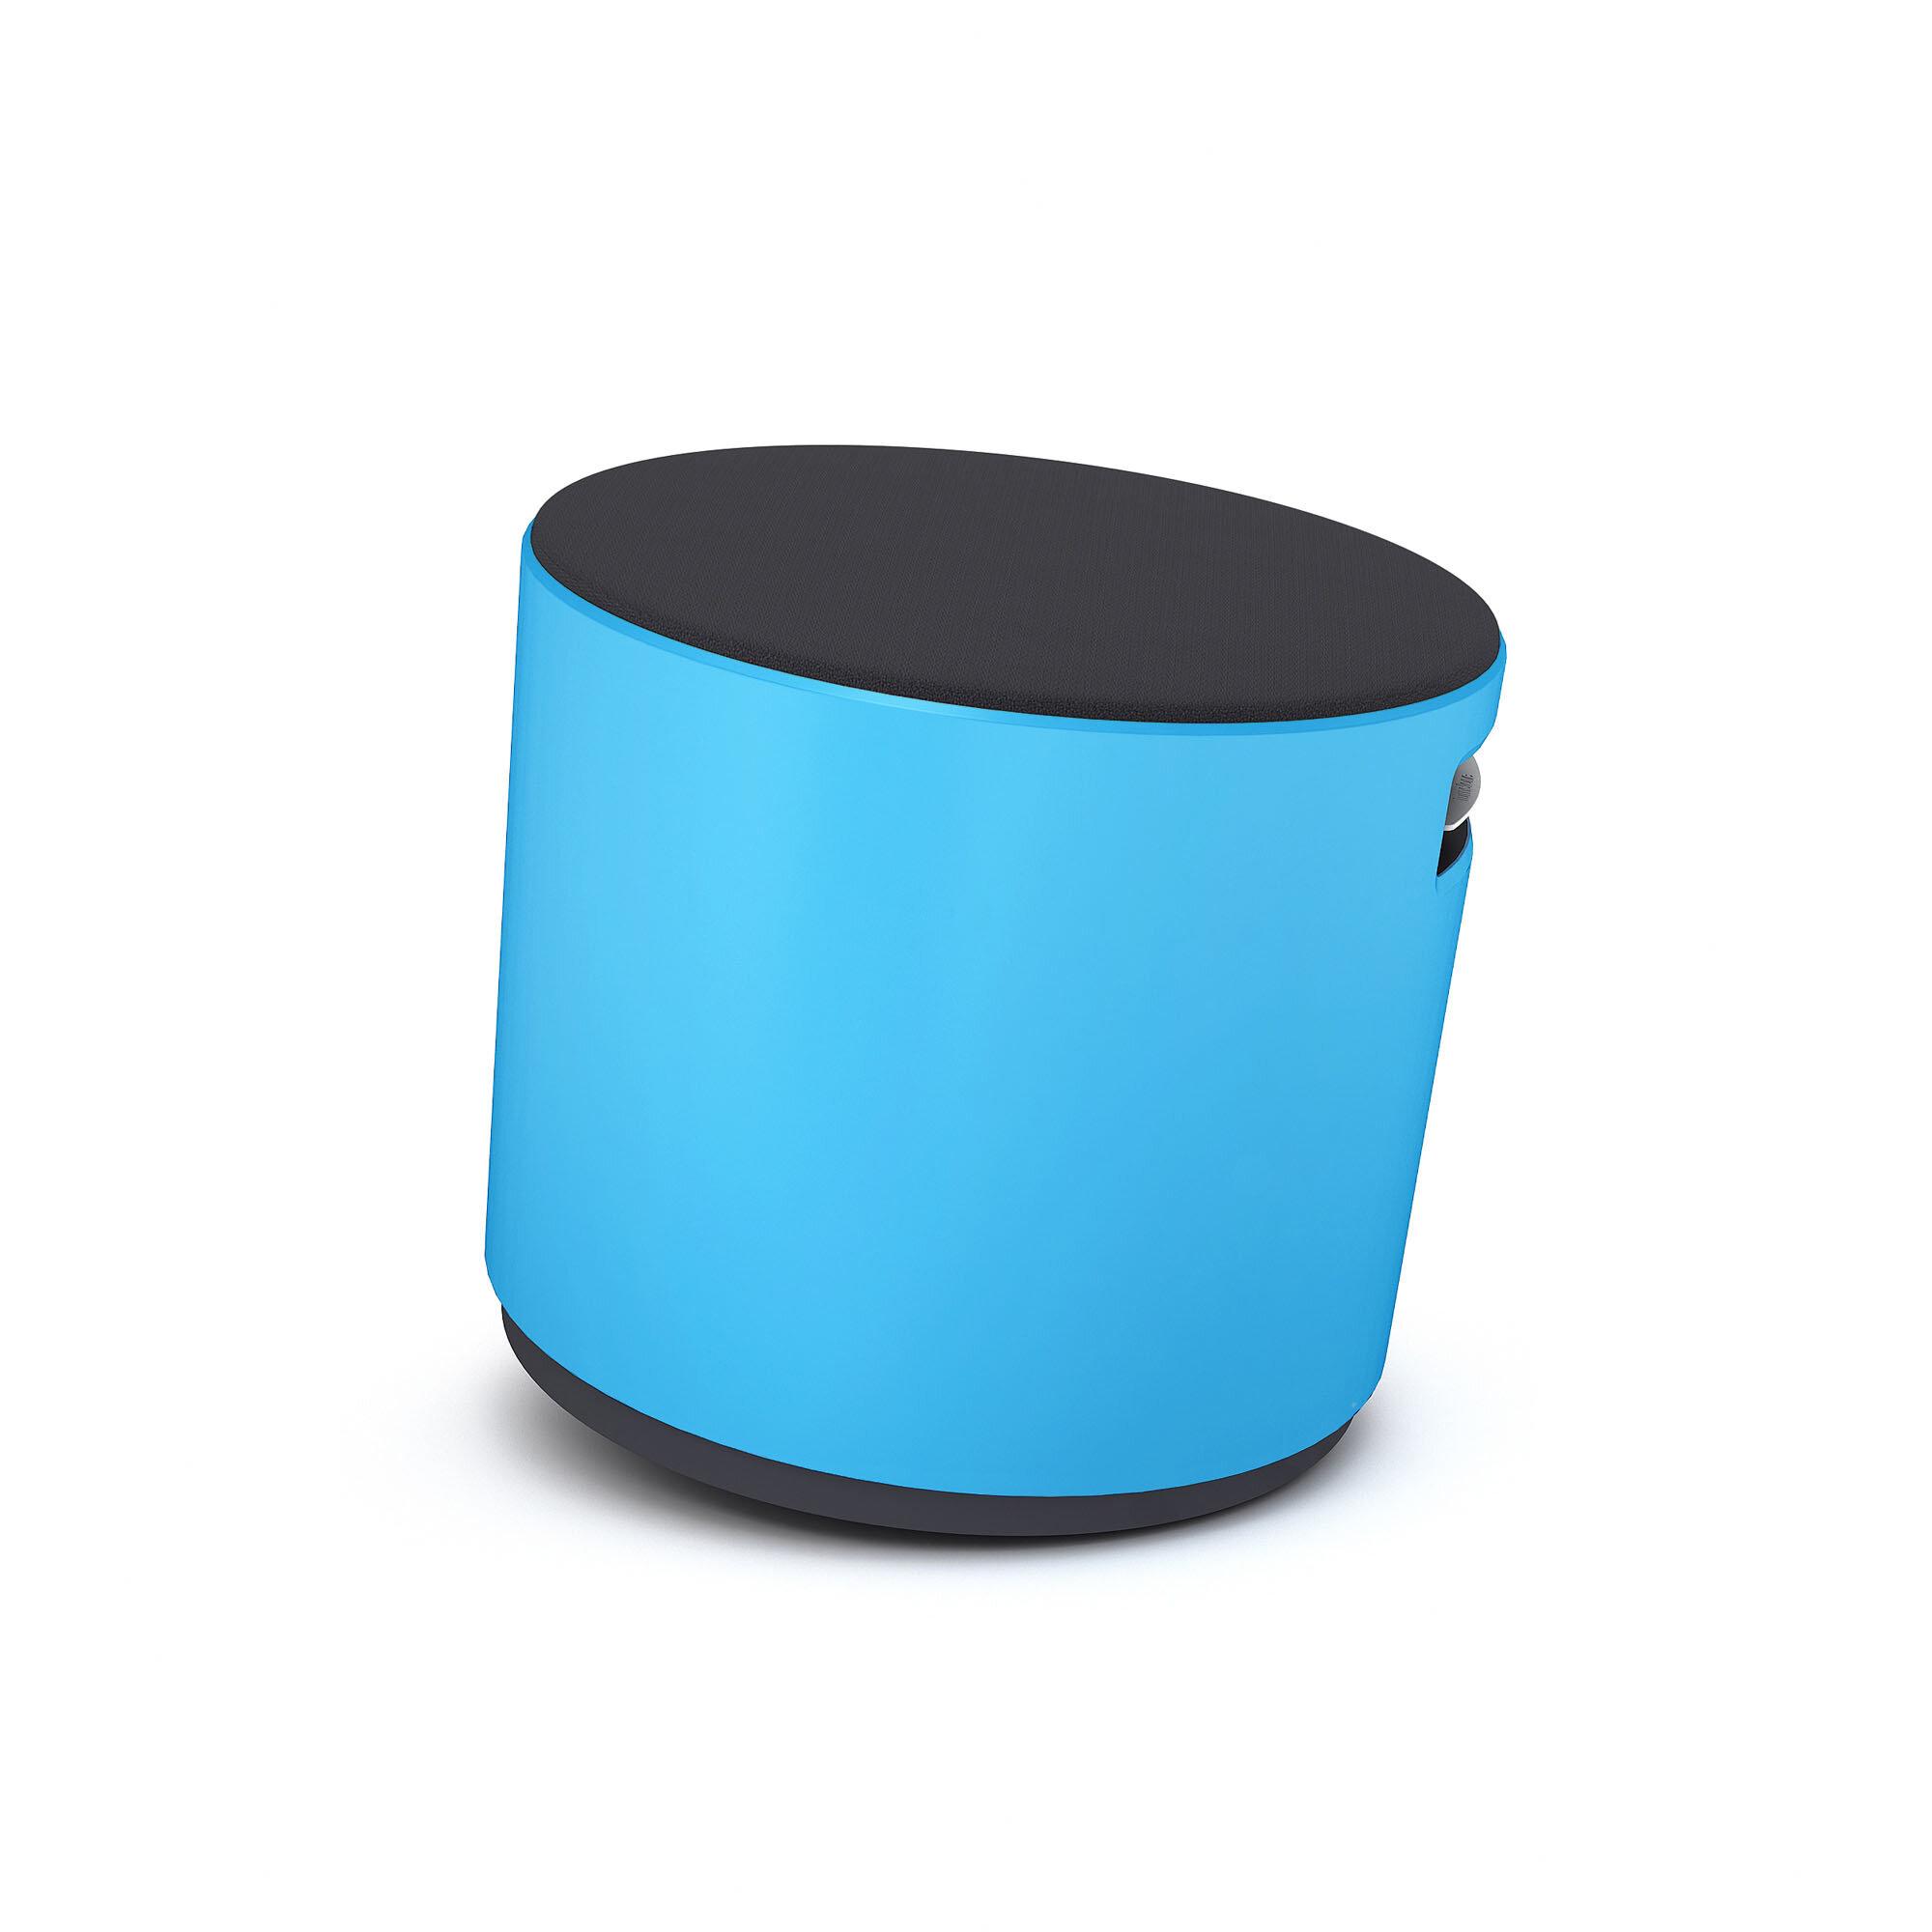 Superbe Wayfair | Steelcase Turnstone Buoy Desk Chair